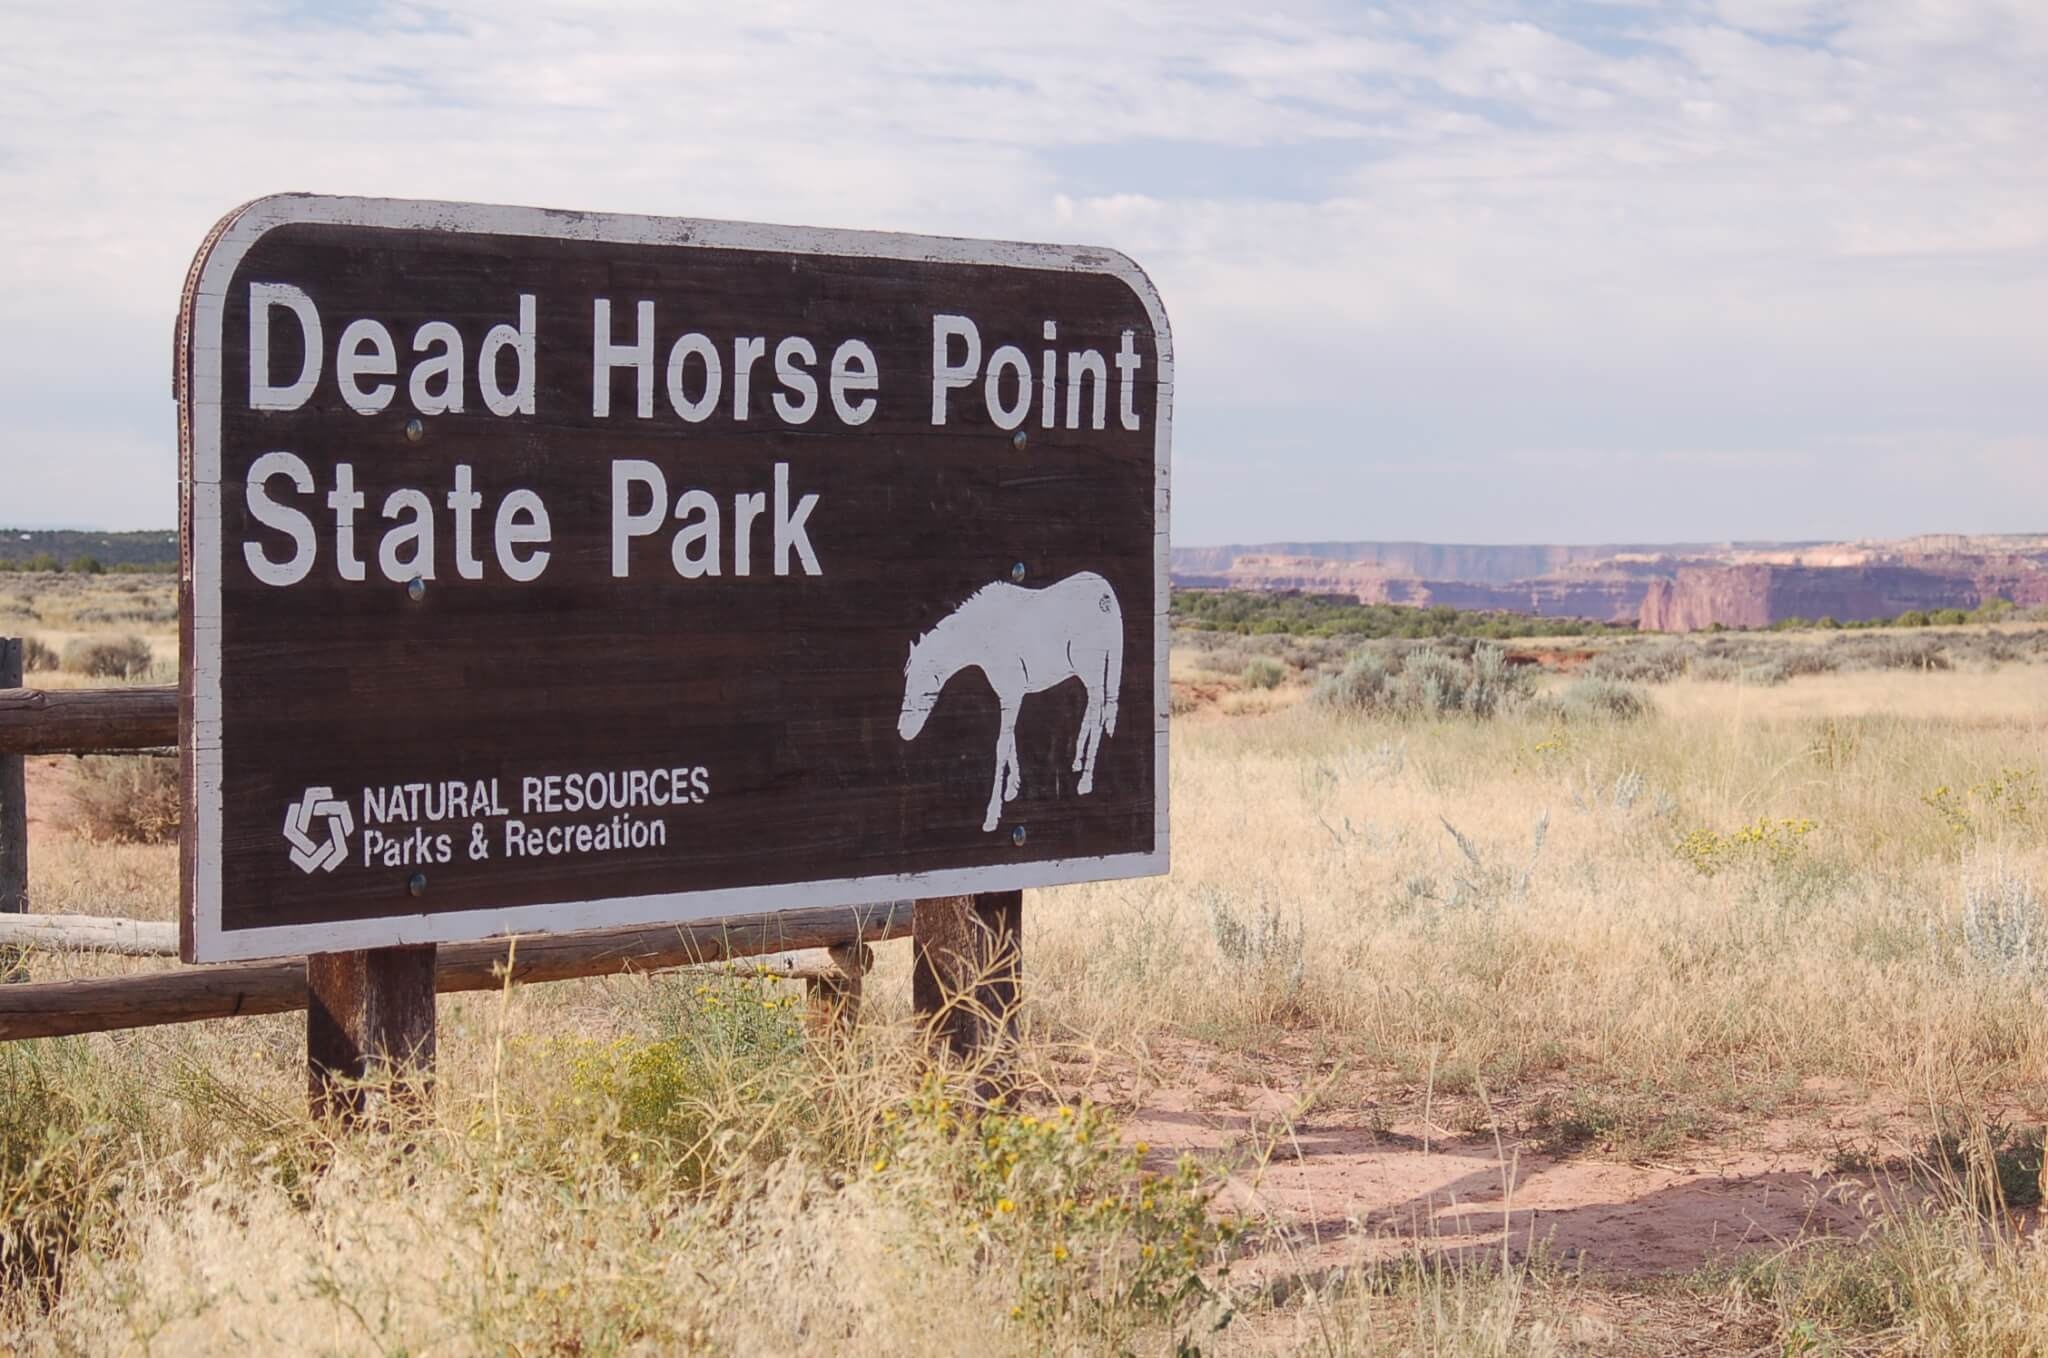 Dead Horse Point State Park Sign_CampsitePhotos.com